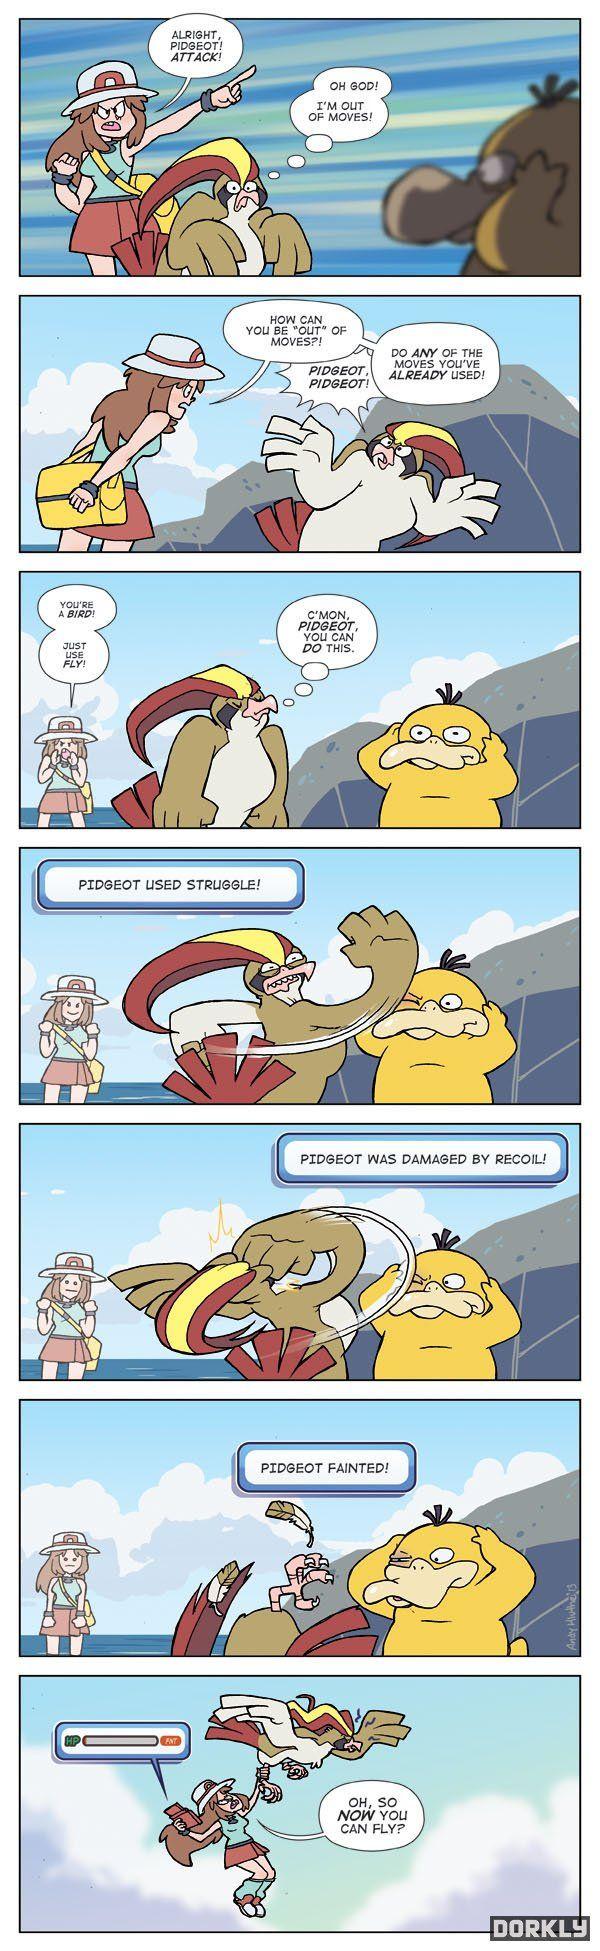 Never made sense! #Truth #lols #video #game #Funny #Videogame #Gaming #References #Reality #Real #Life #Joke. #Geek #humor #Funny #Pokemon #Nintendo